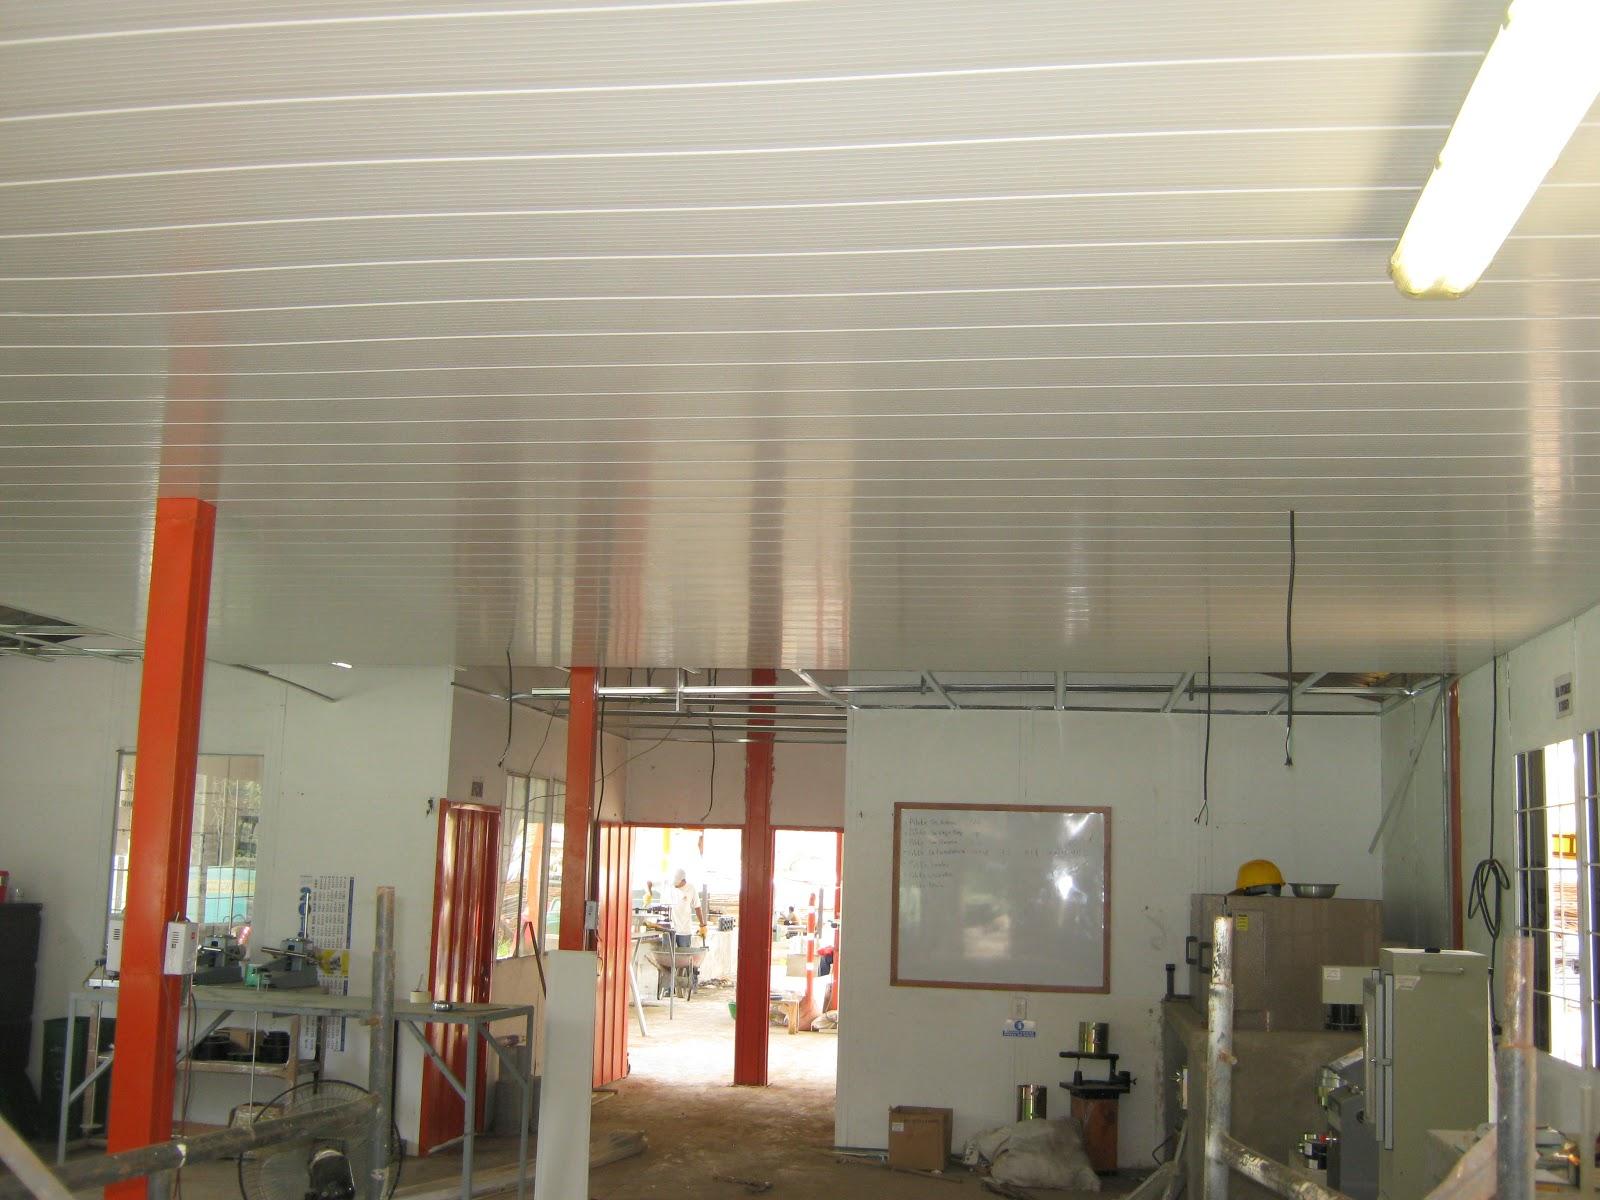 Constru f cil drywall cielo raso p v c for Cielos rasos modernos